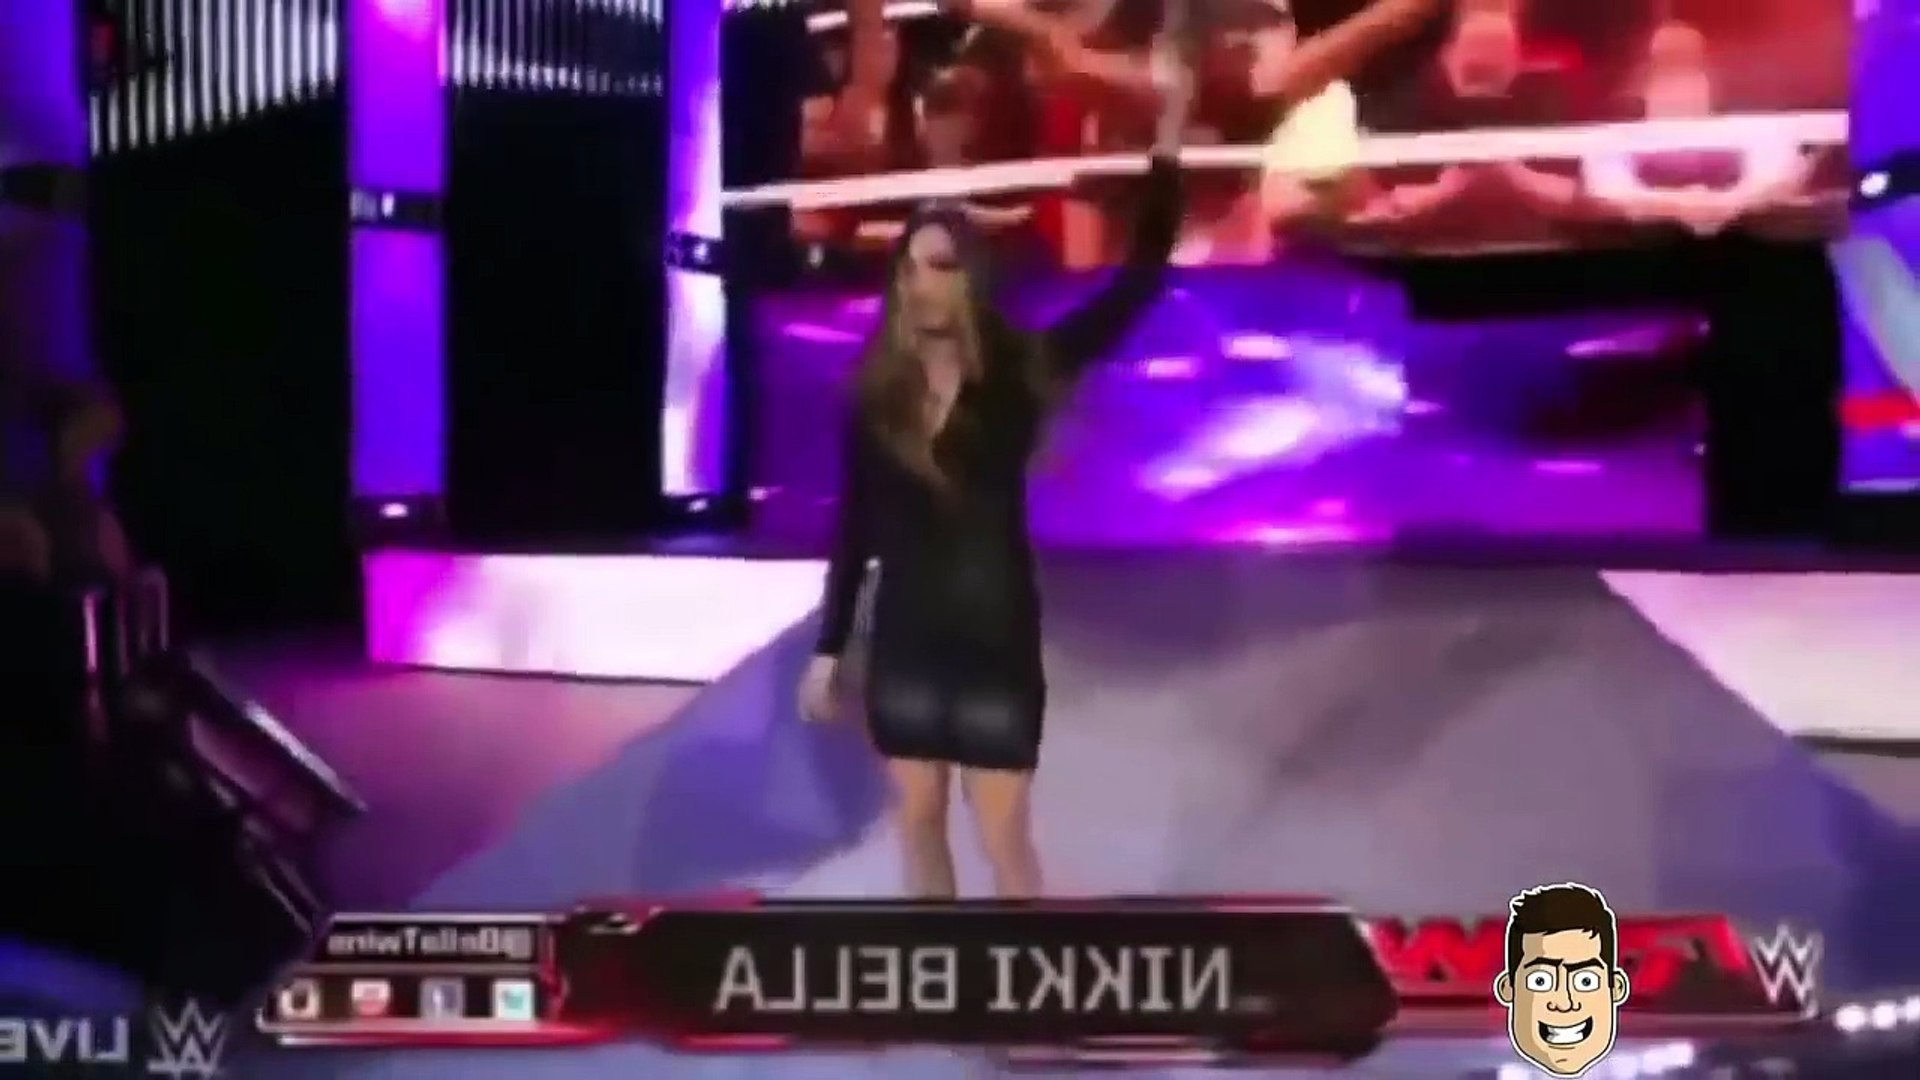 WWE TOP 100 DIVA BOTCHES WWE Woman Fails Wrestling Funny Moments pee poo fart wwe